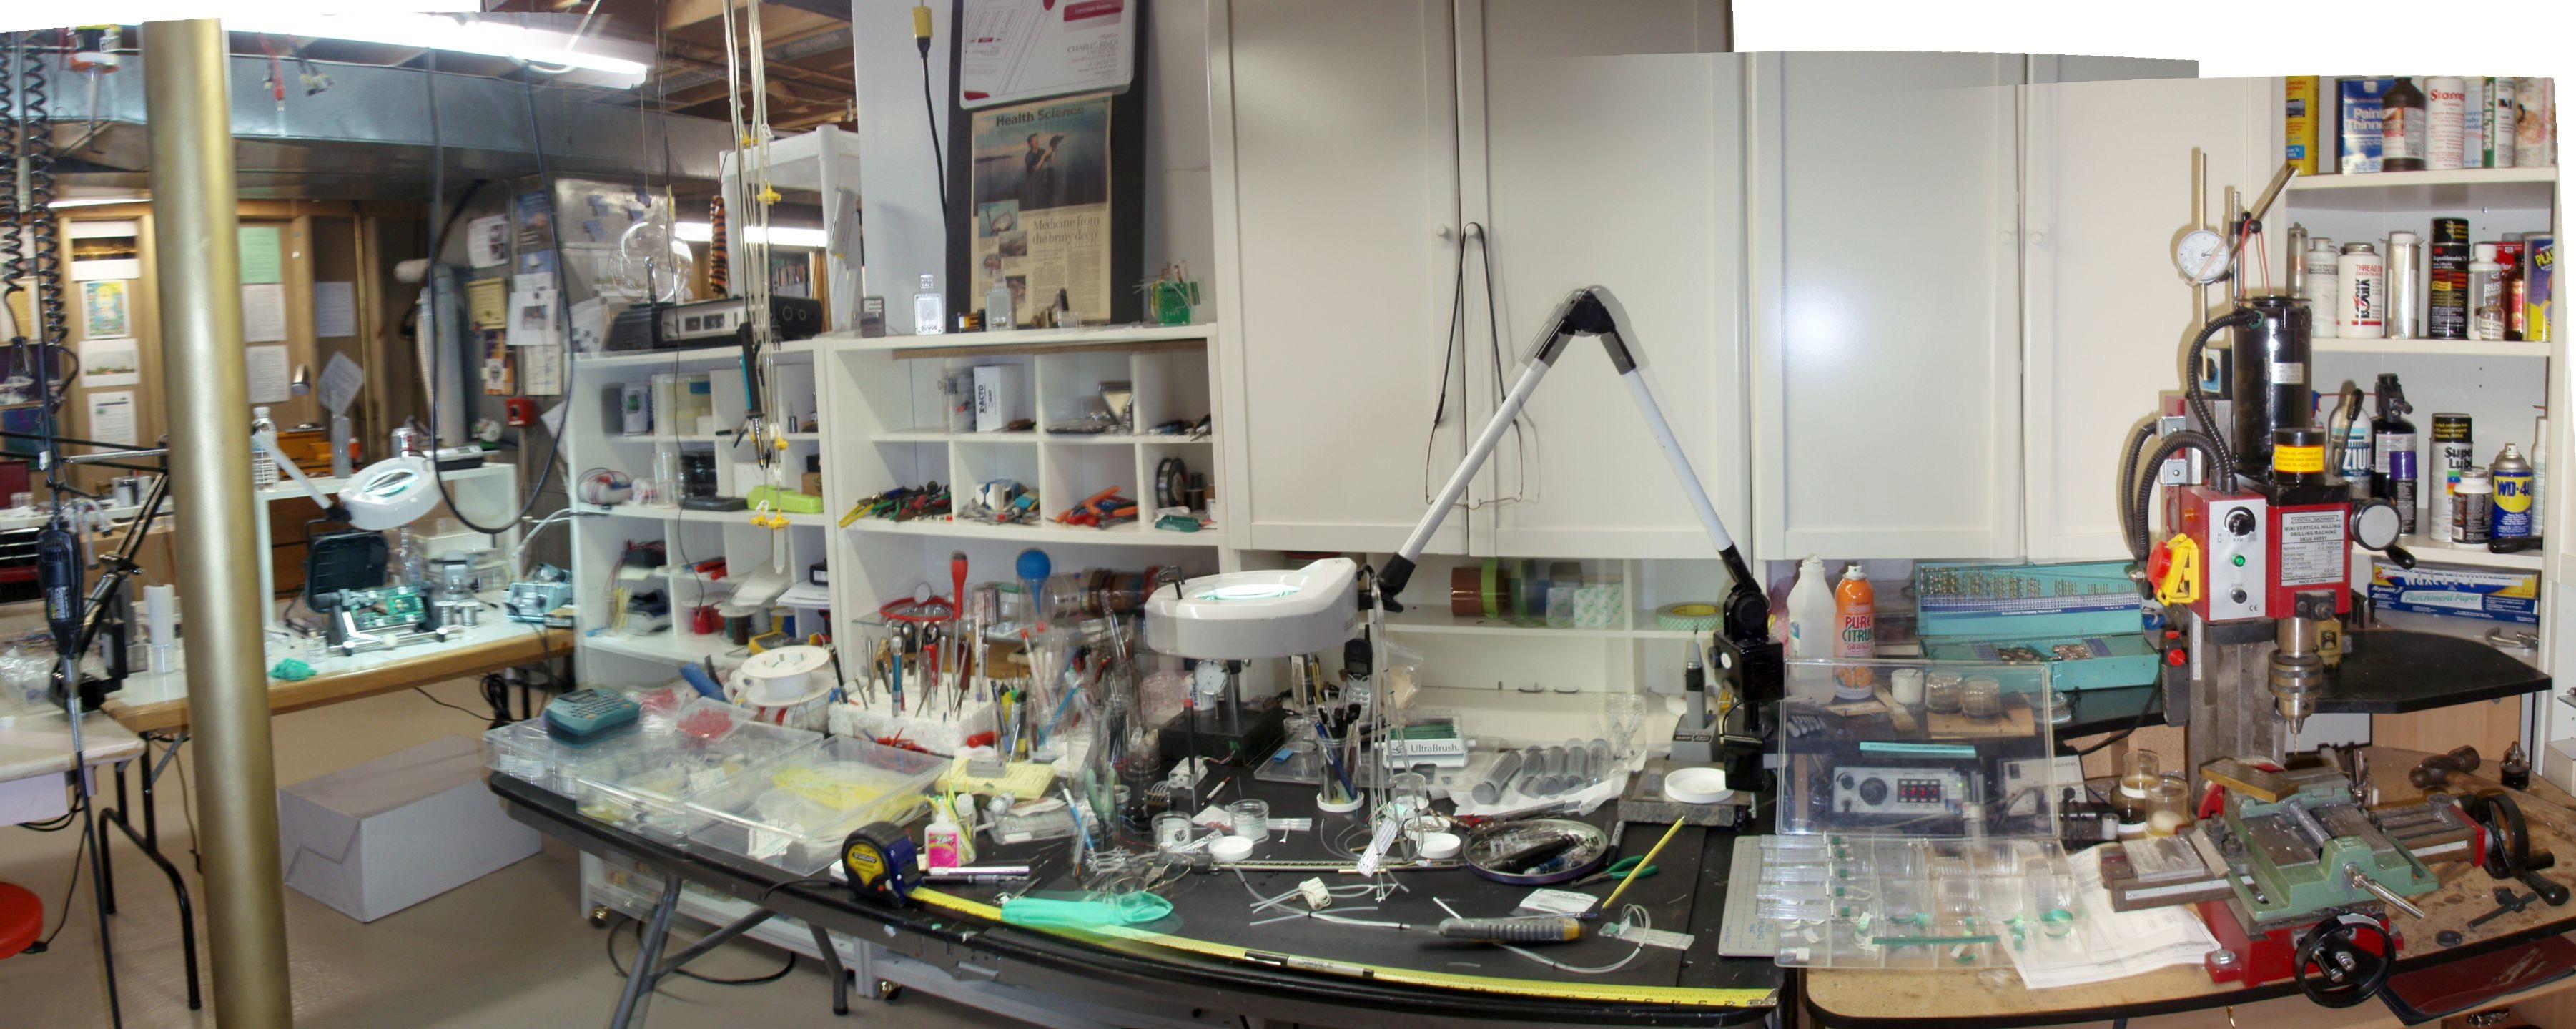 Frank's Lab.jpg